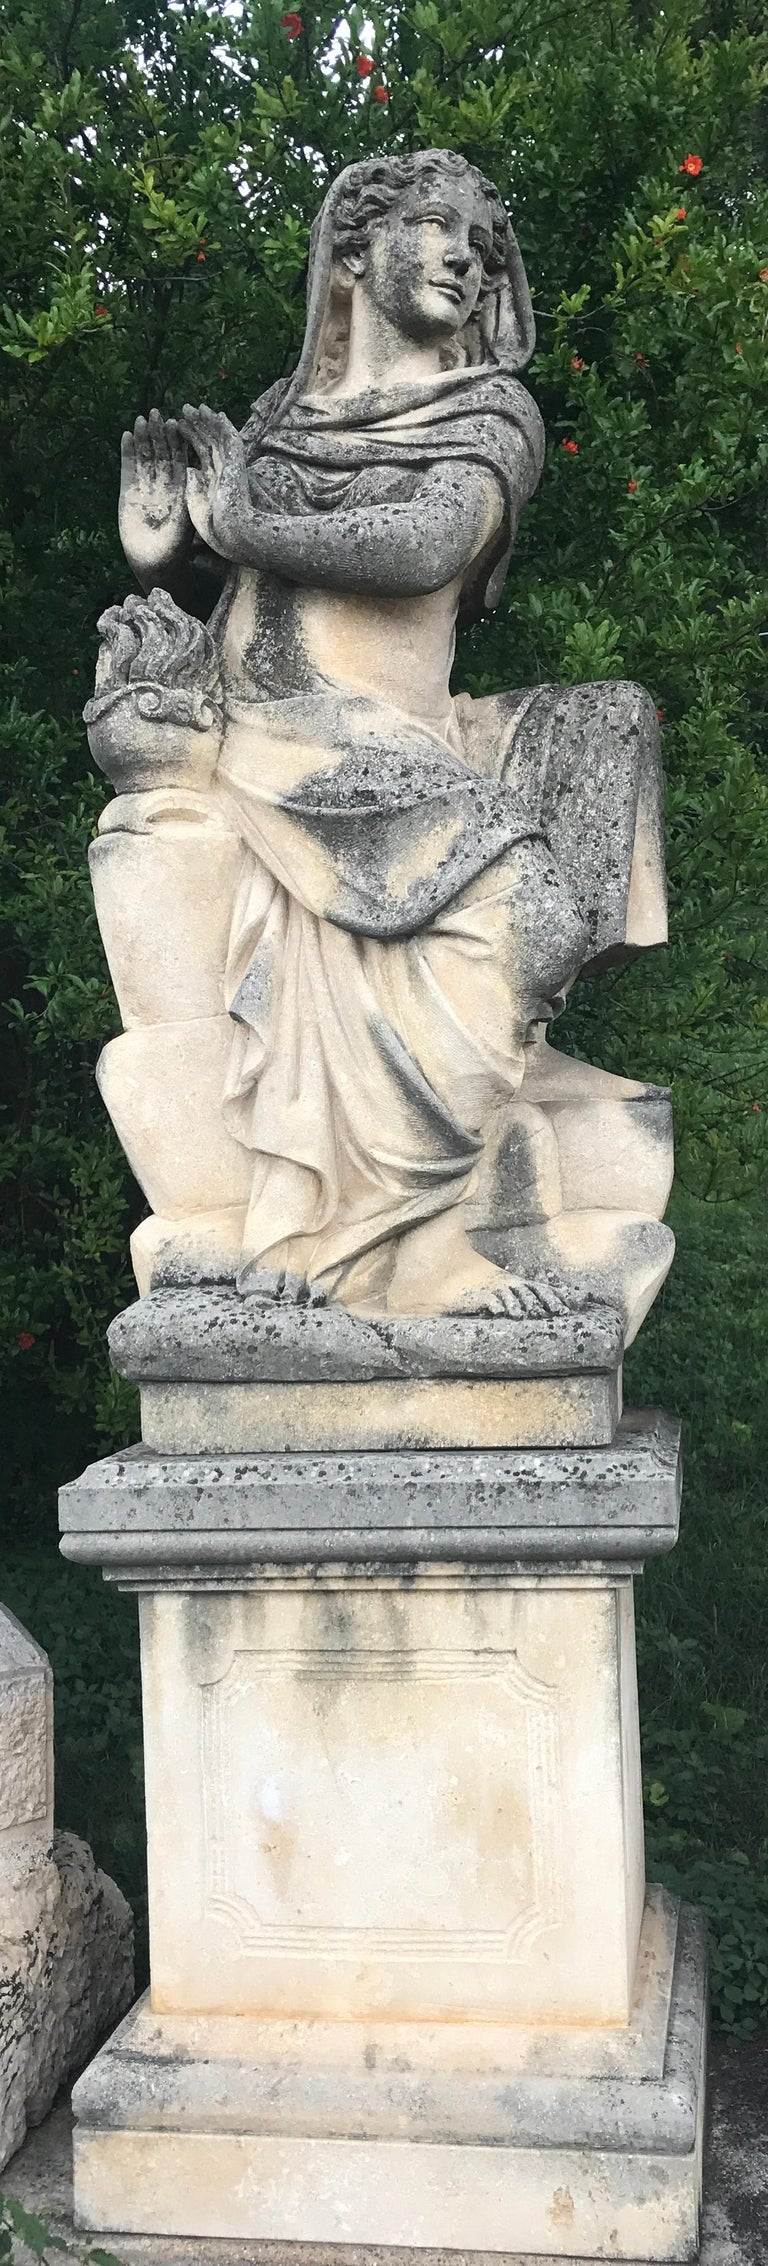 20th Century Four Seasons Extraordinary Italian Stone Sculptures For Sale